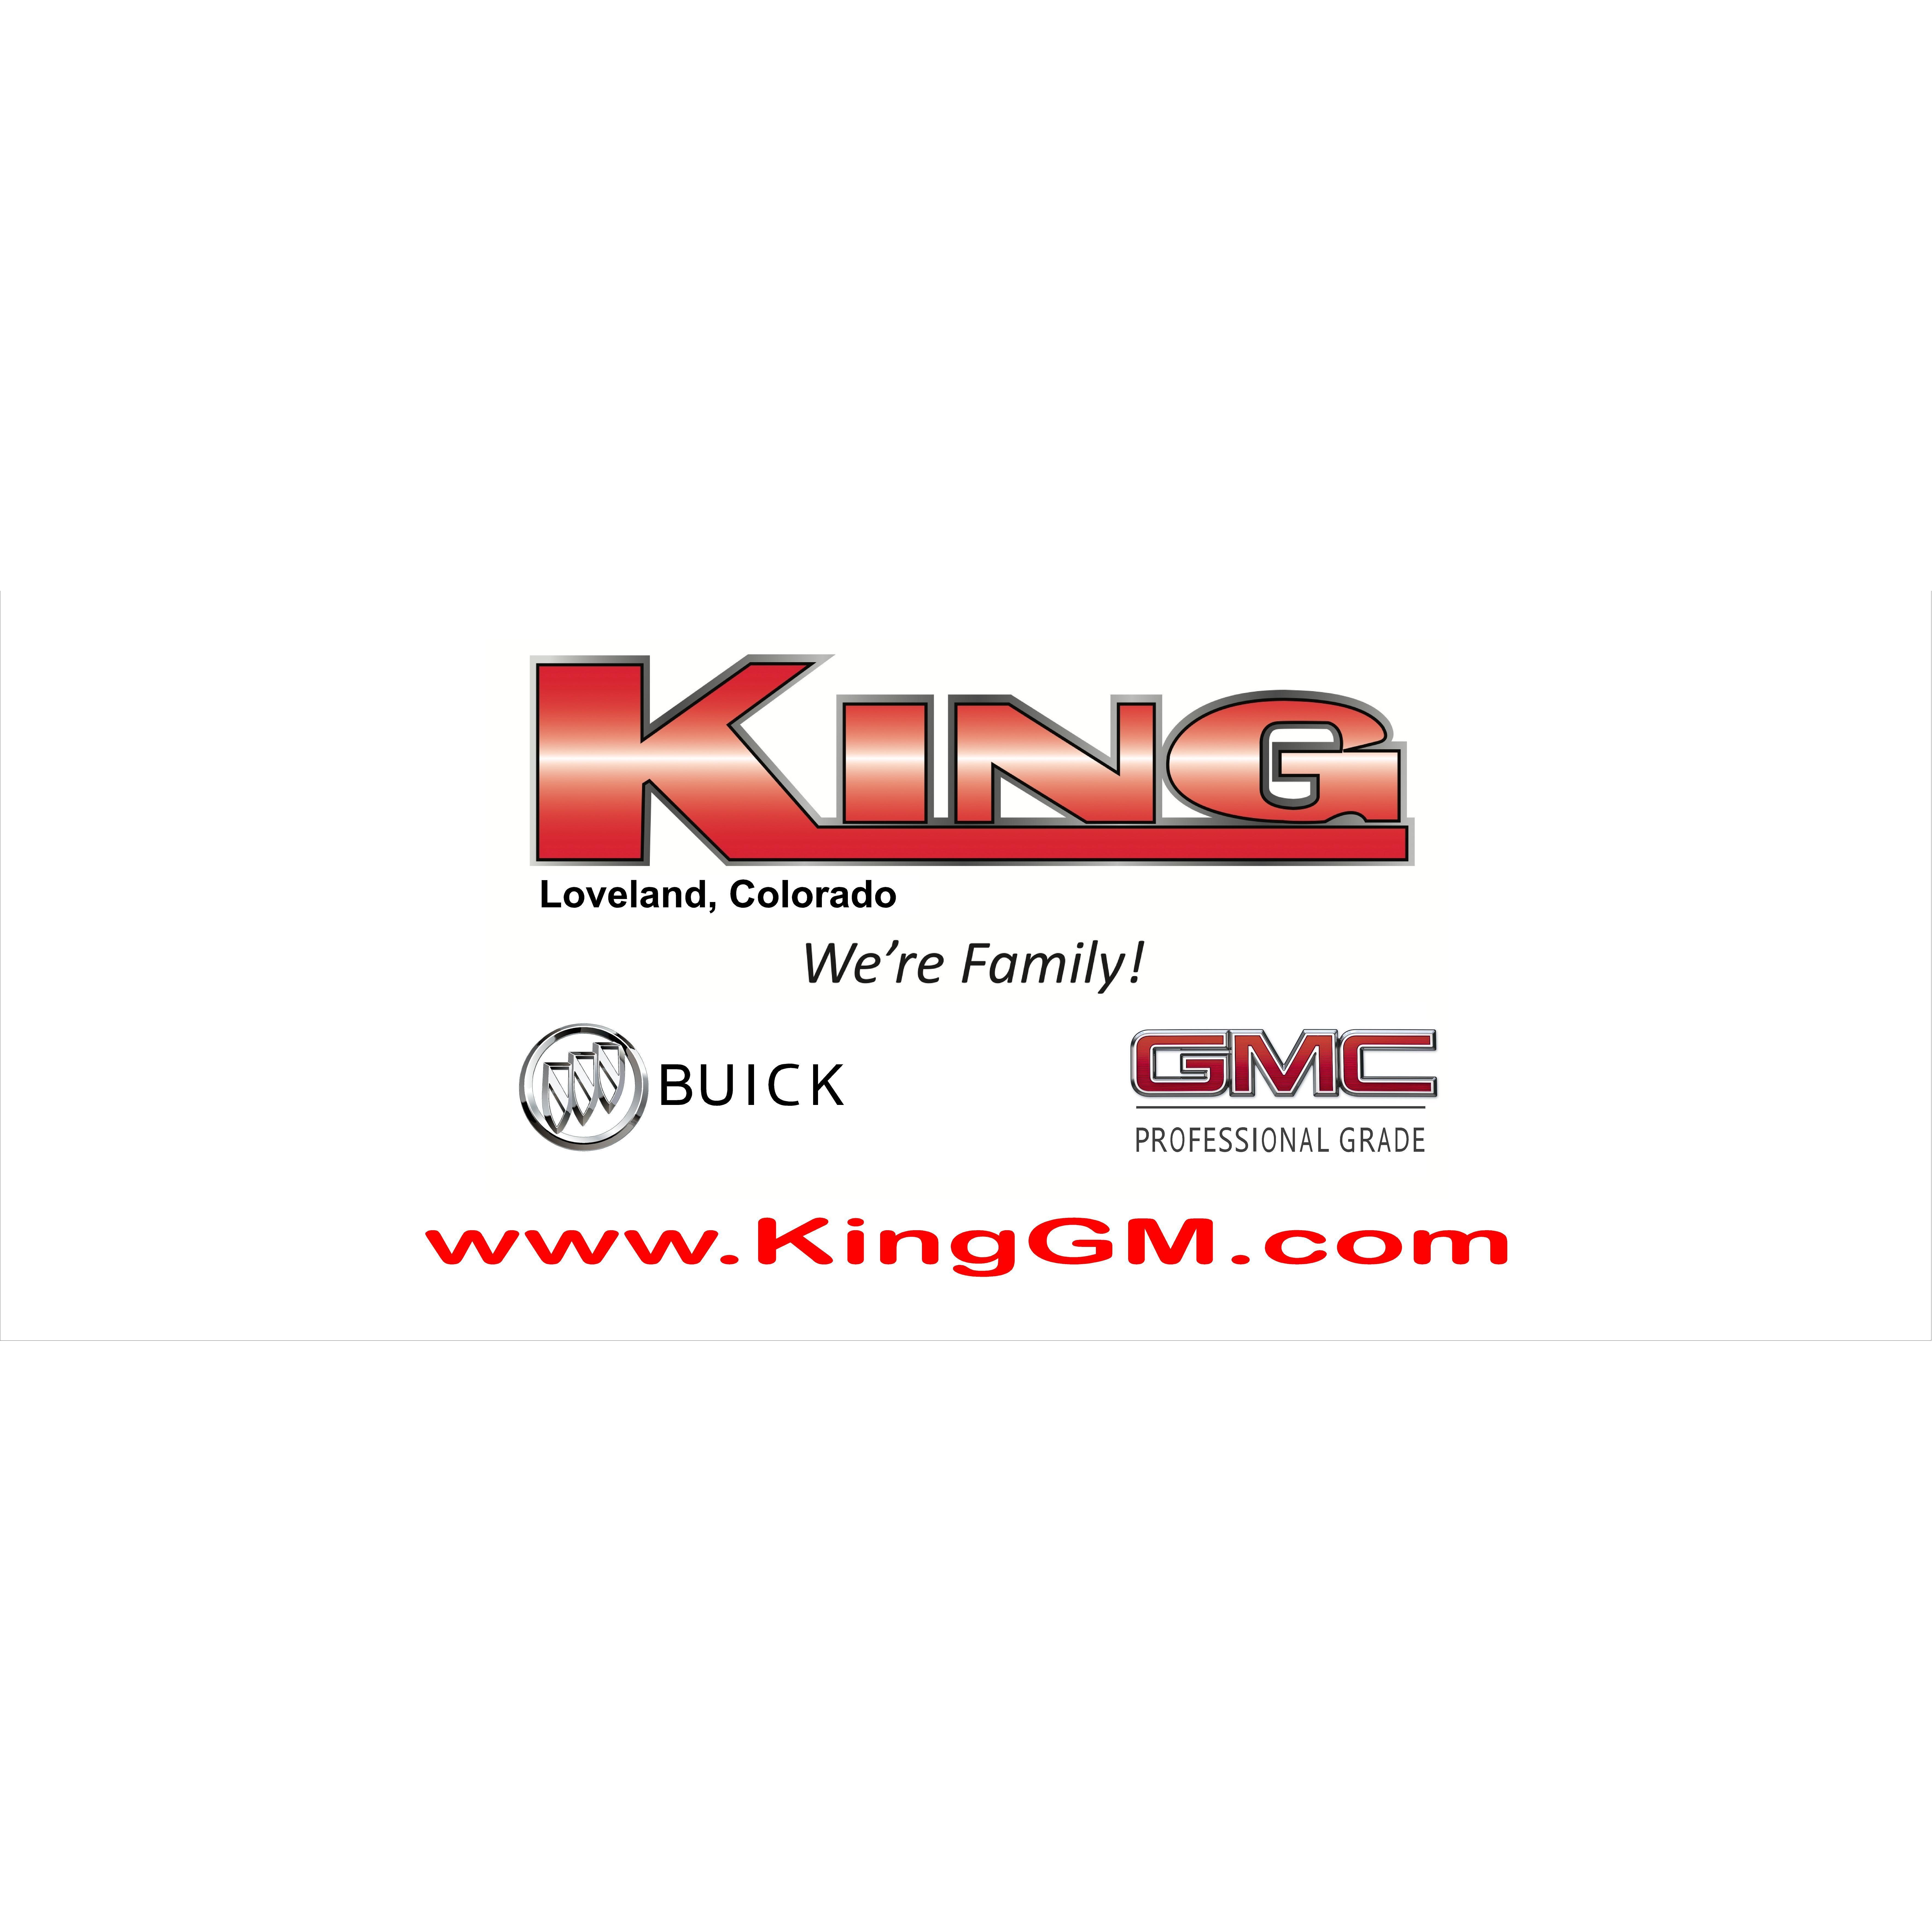 King Buick Gmc In Loveland Co 80538 Chamberofcommerce Com